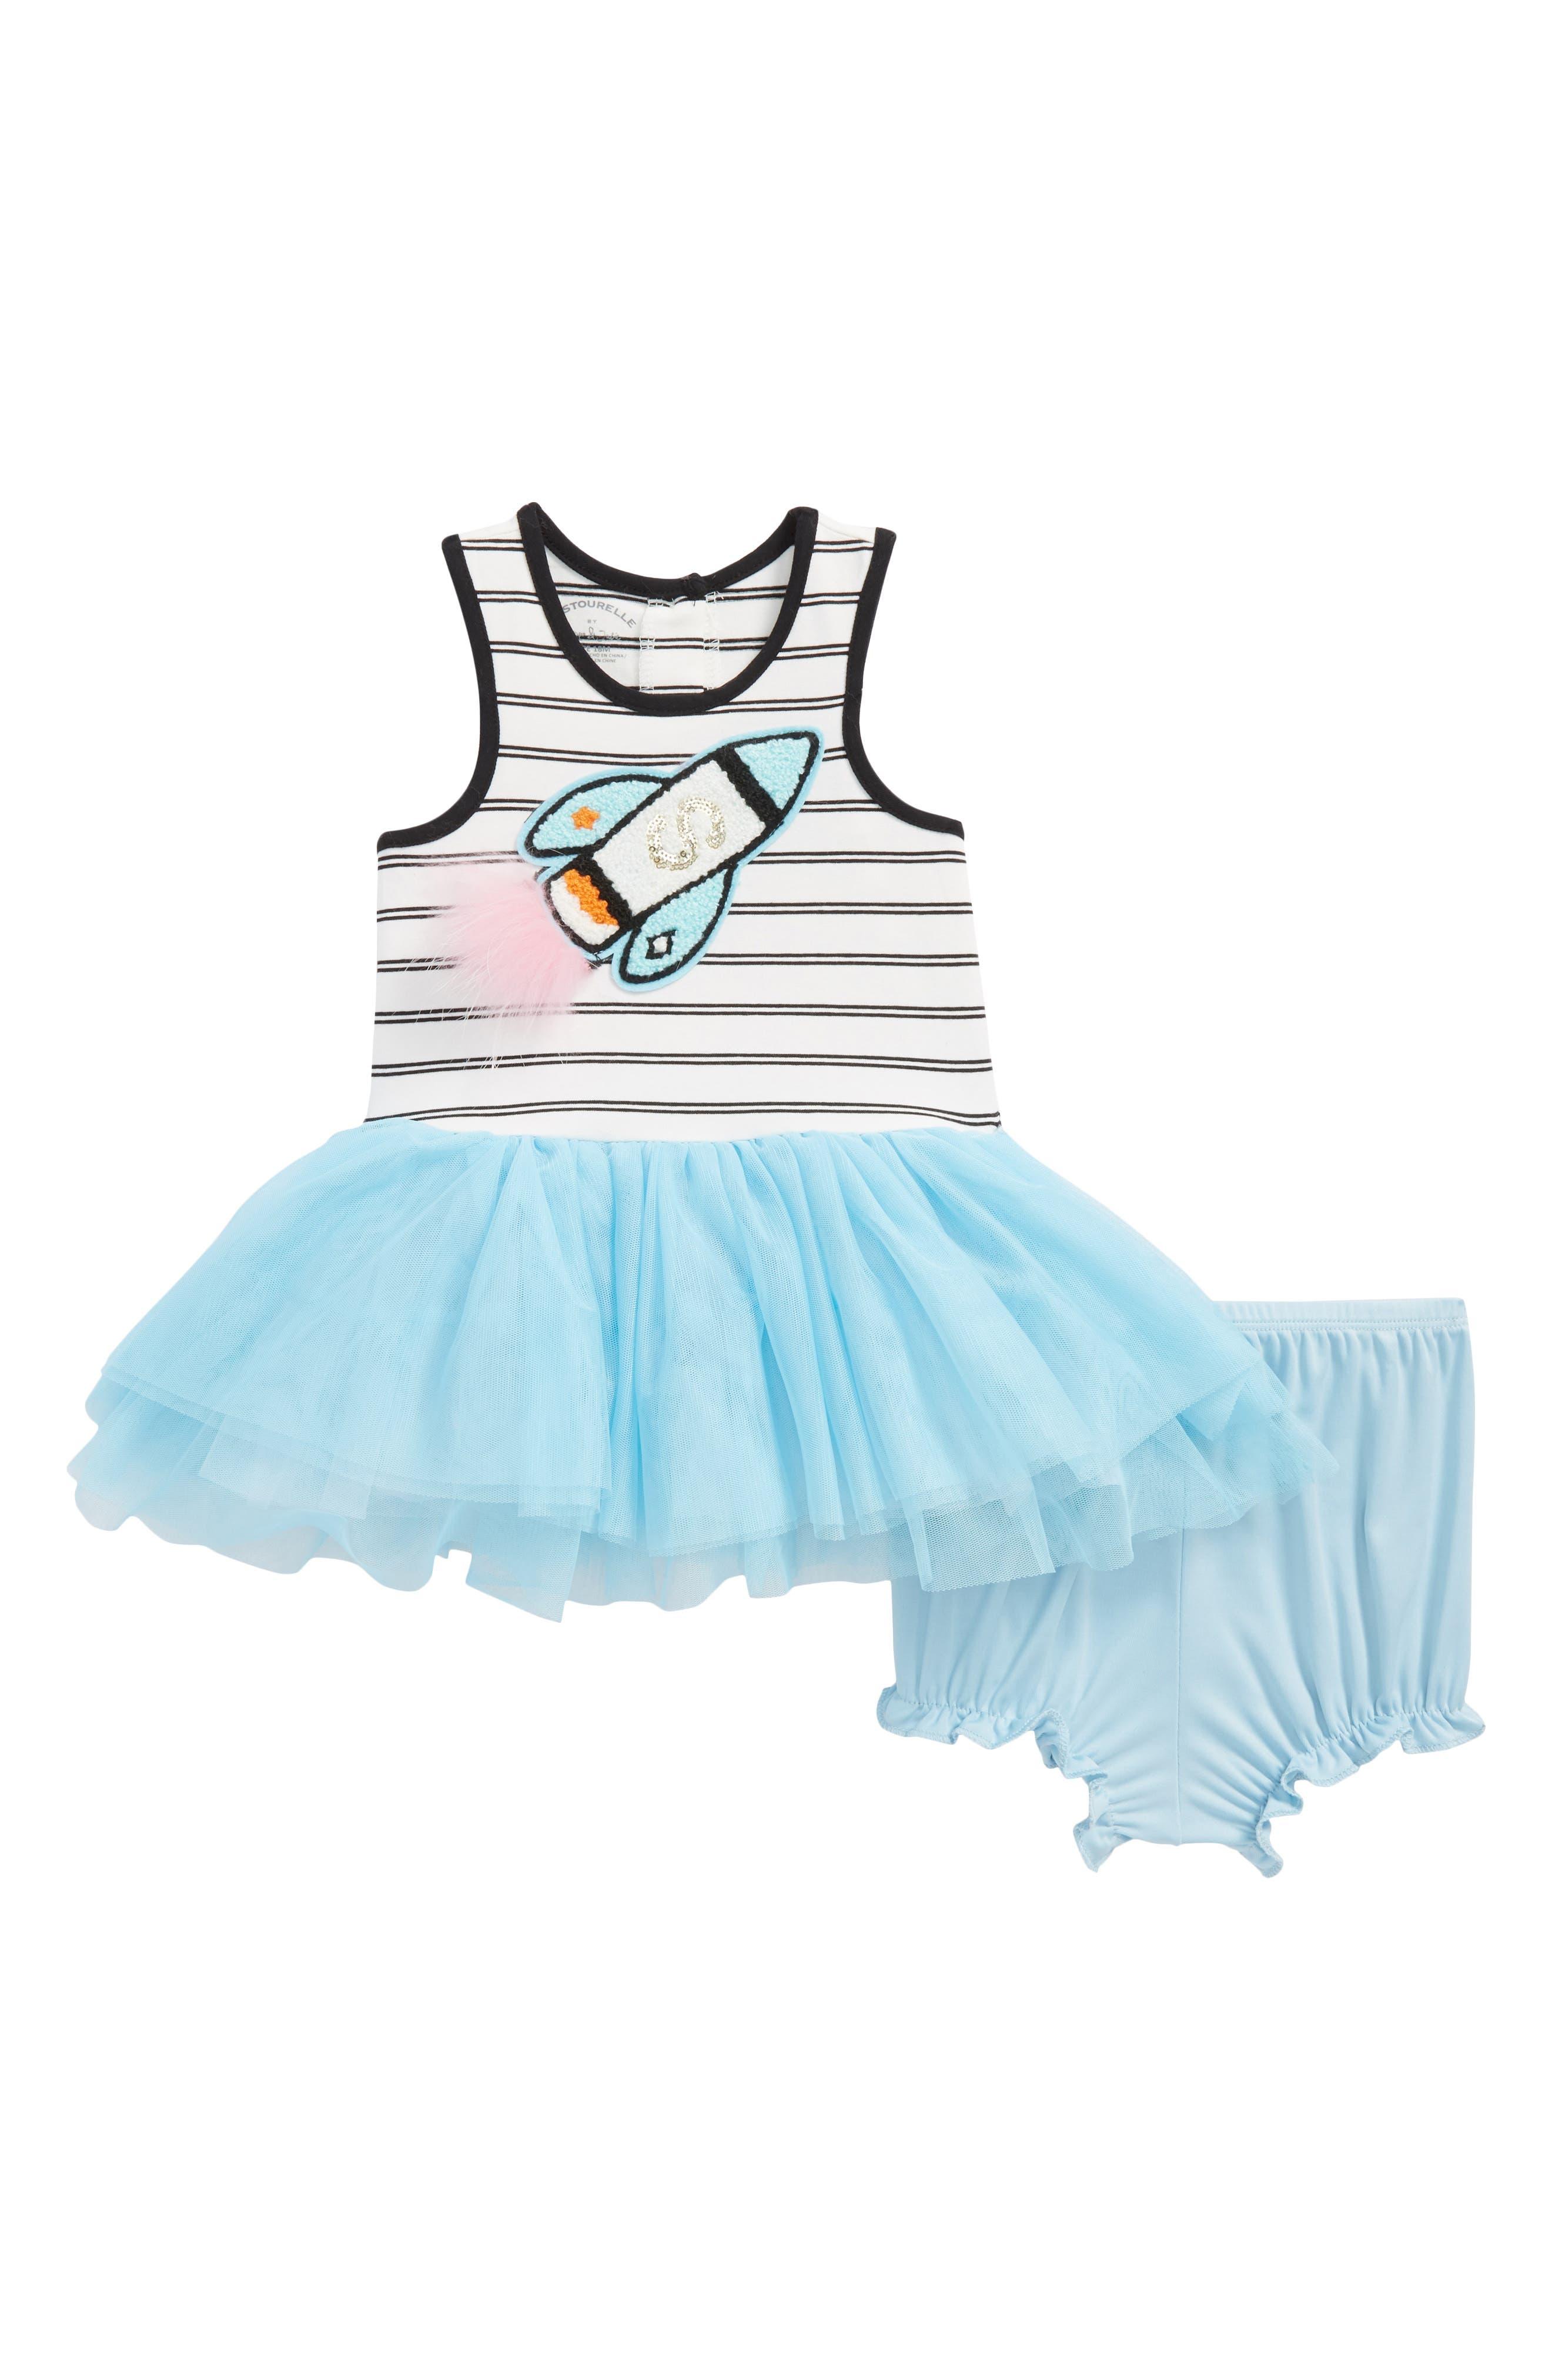 Rocket Tutu Dress,                             Main thumbnail 1, color,                             117